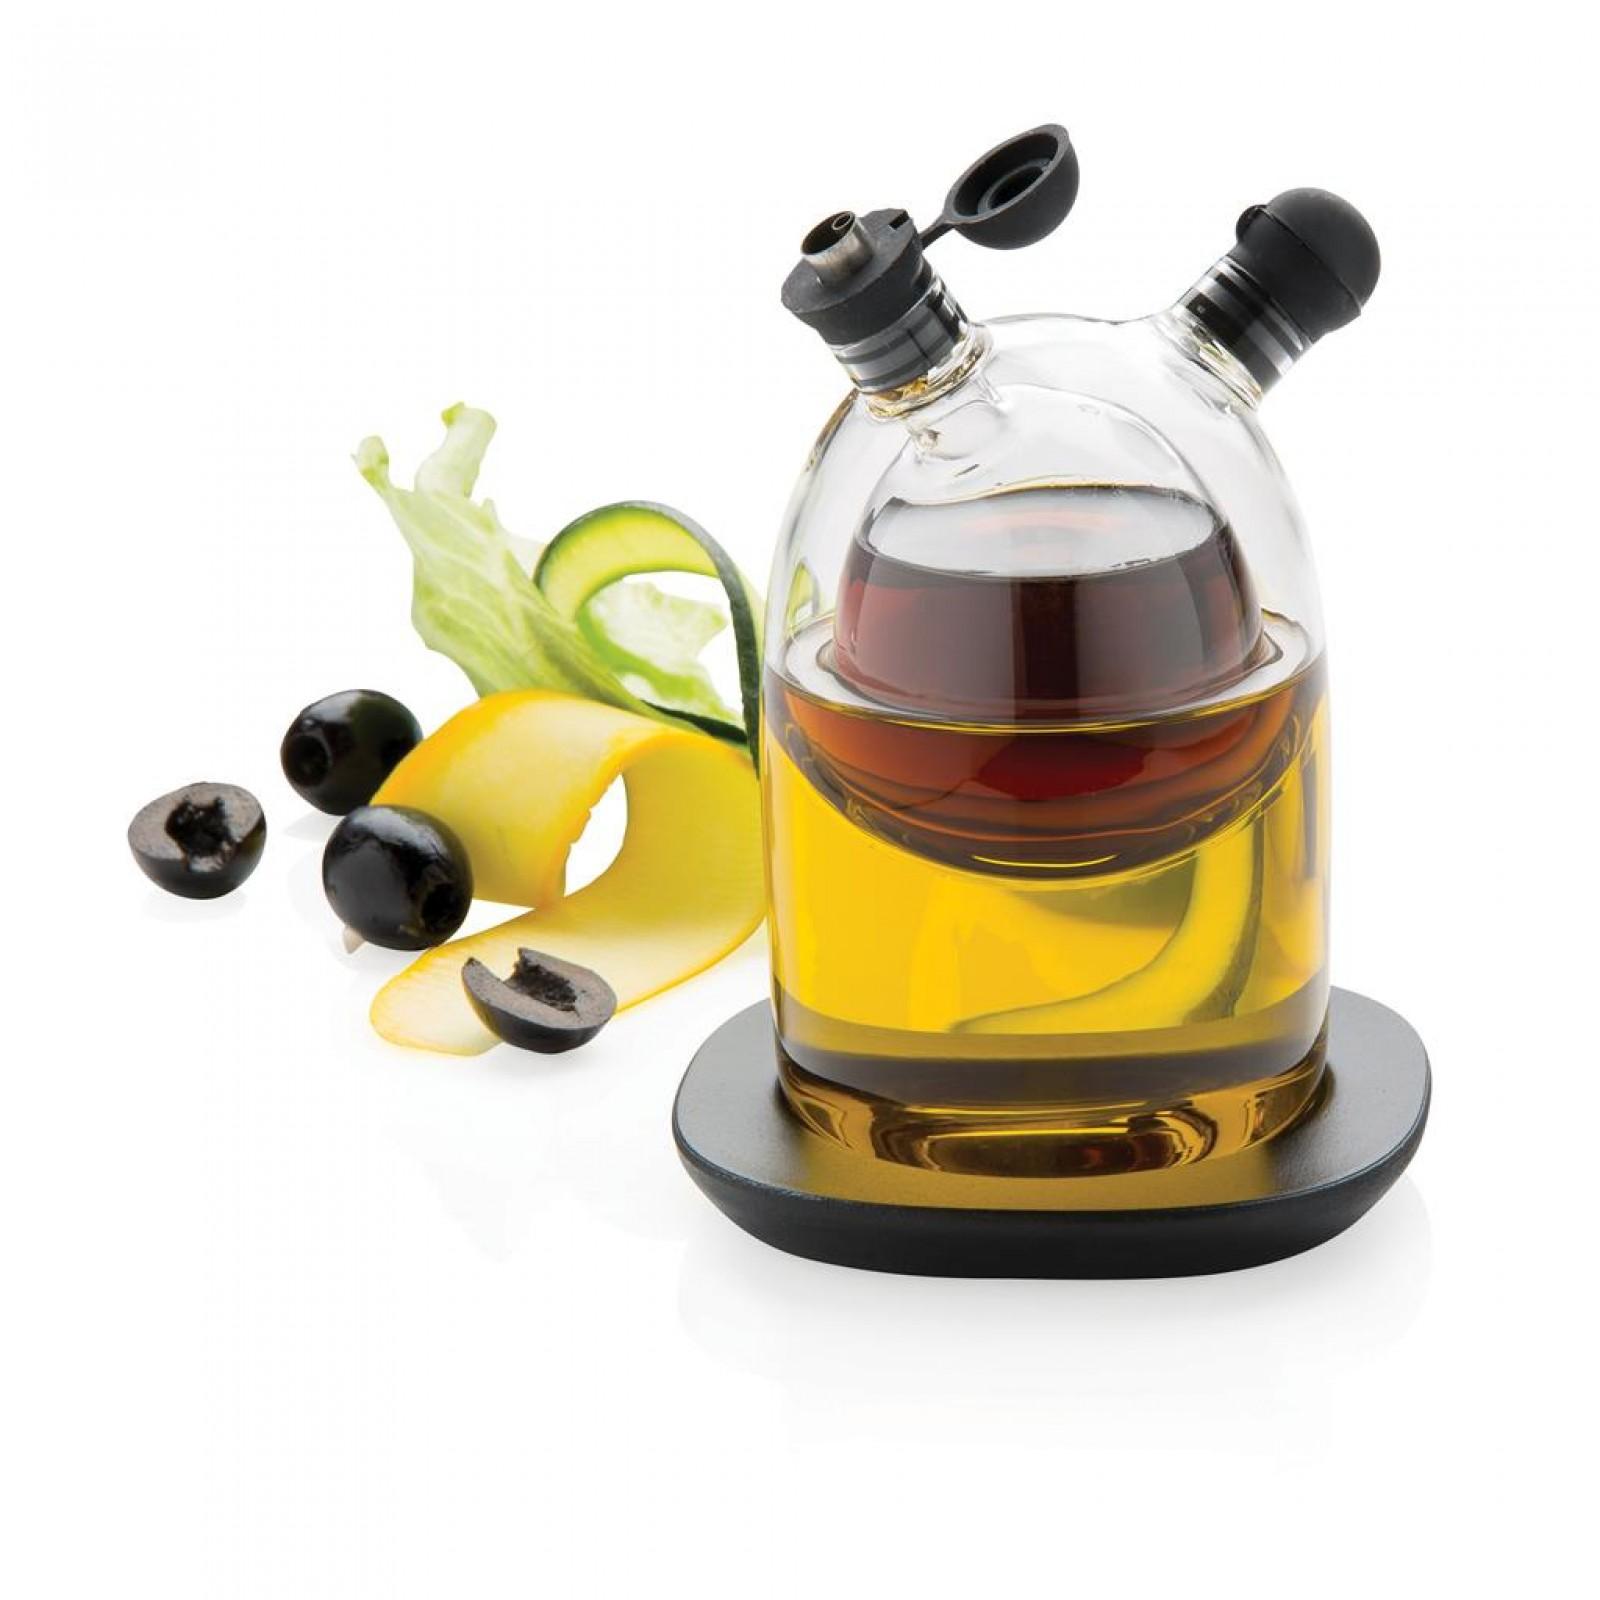 Orbit 2.0 Oil & Vinegar Set - XD Design